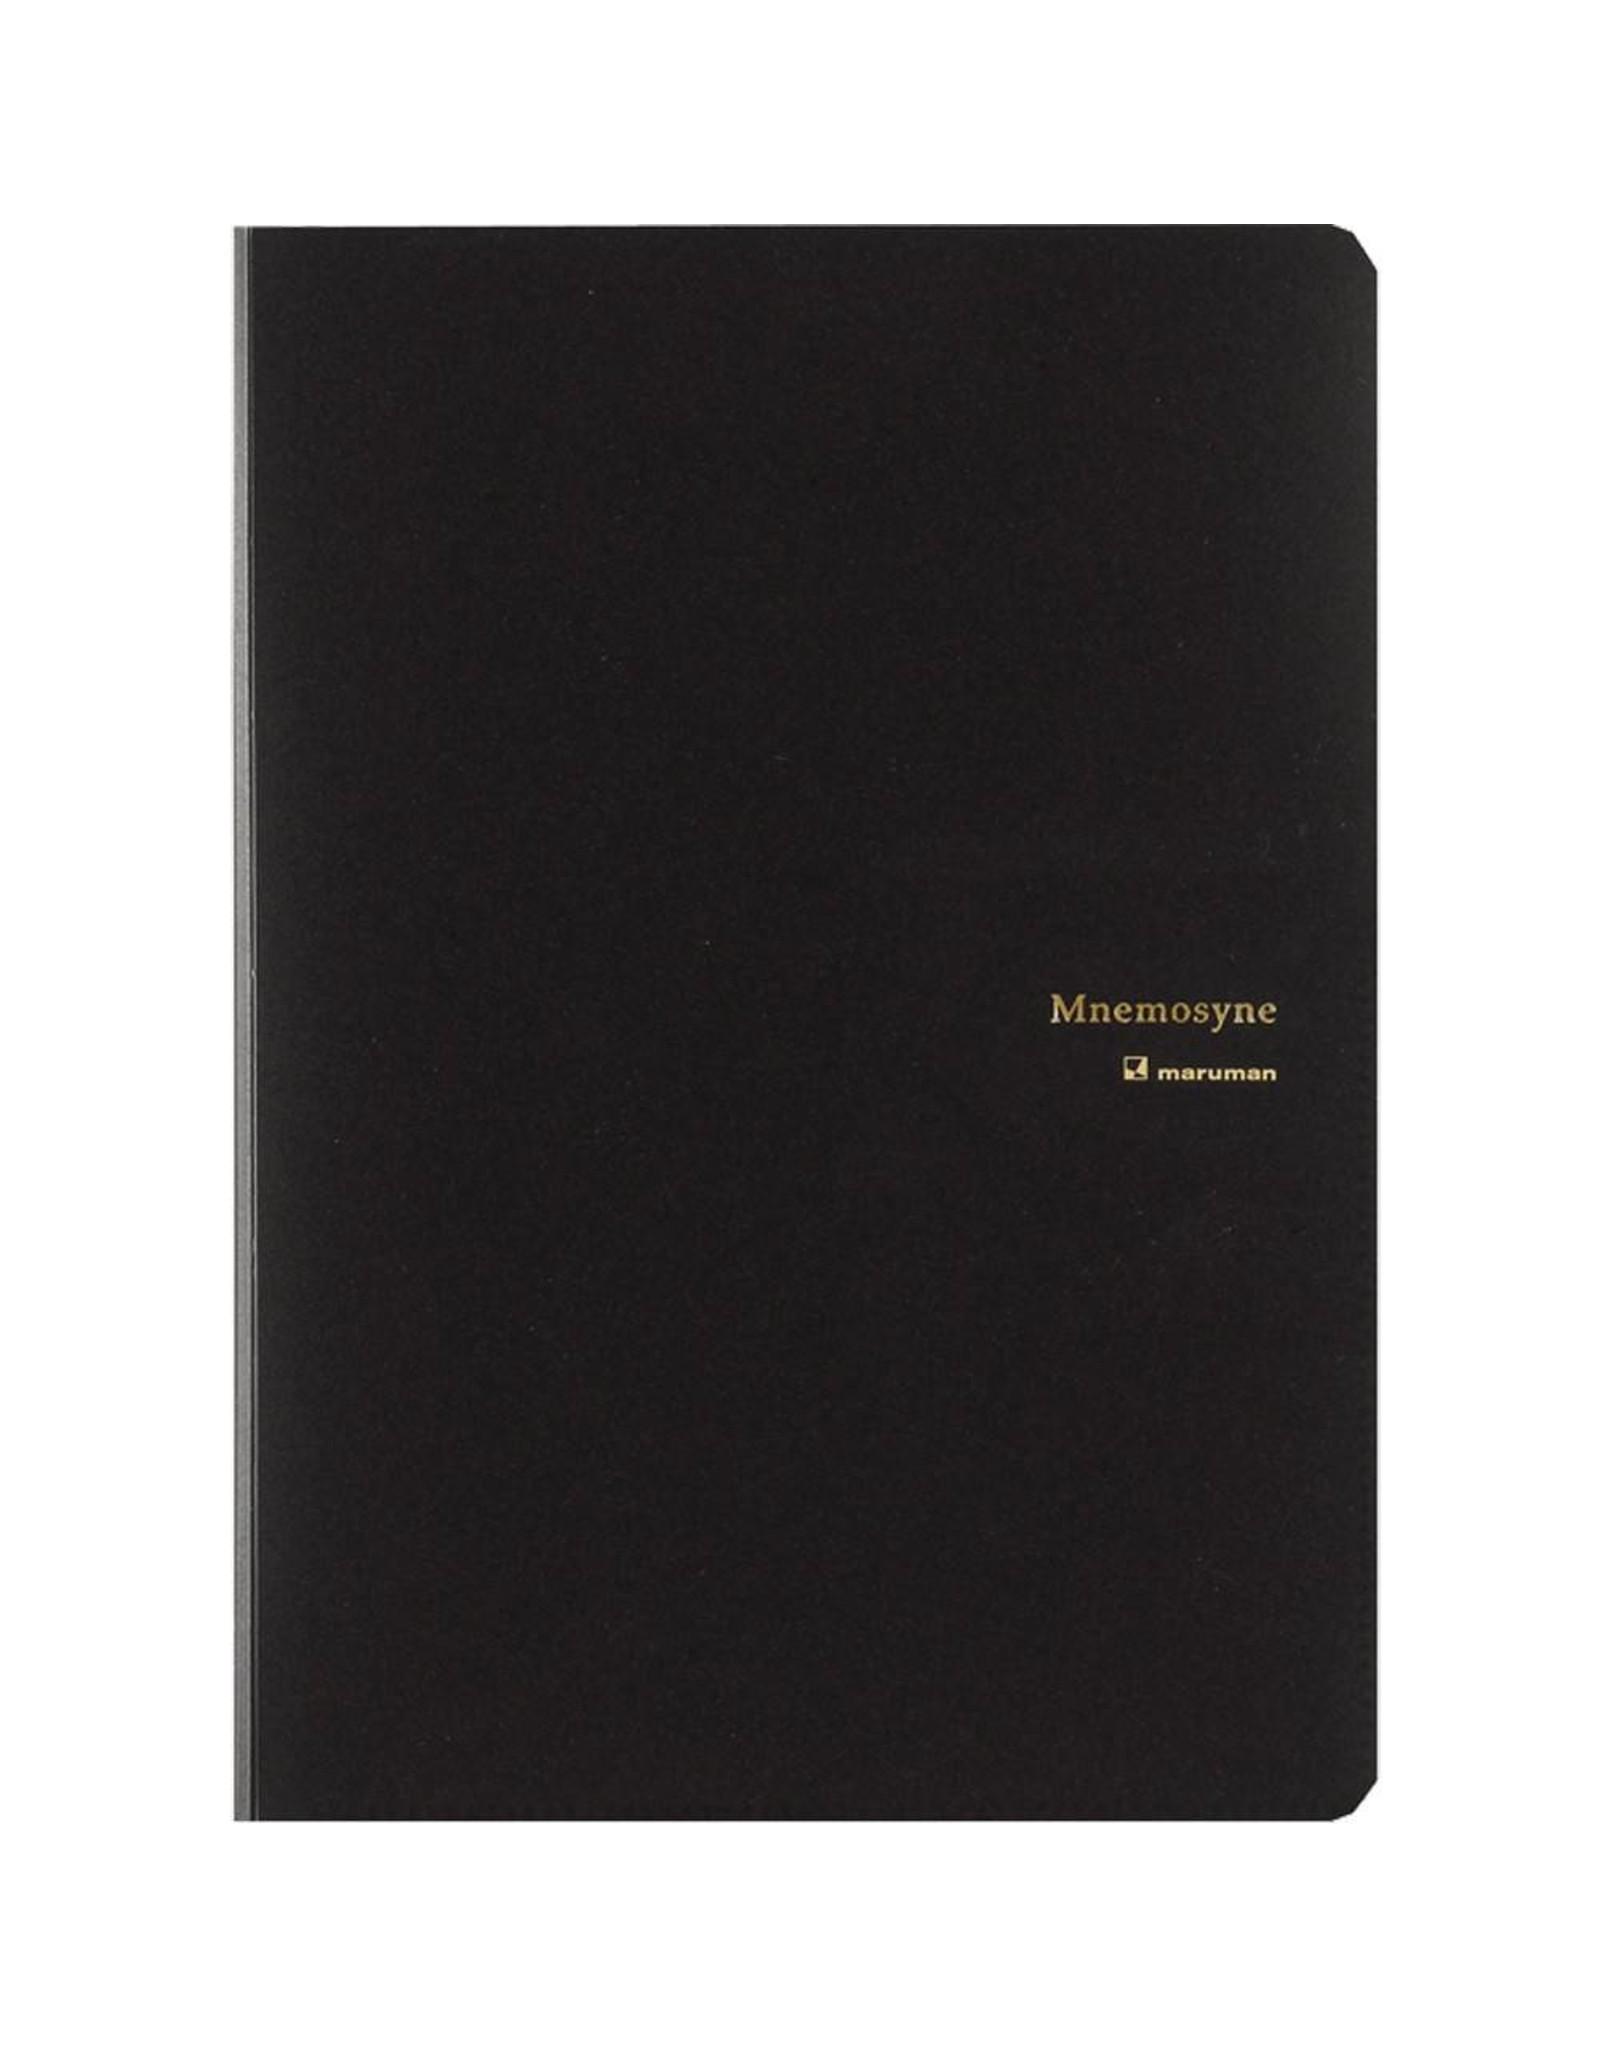 MARUMAN HN187A MNEMOSYNE NOTEPAD AND HOLDER A4